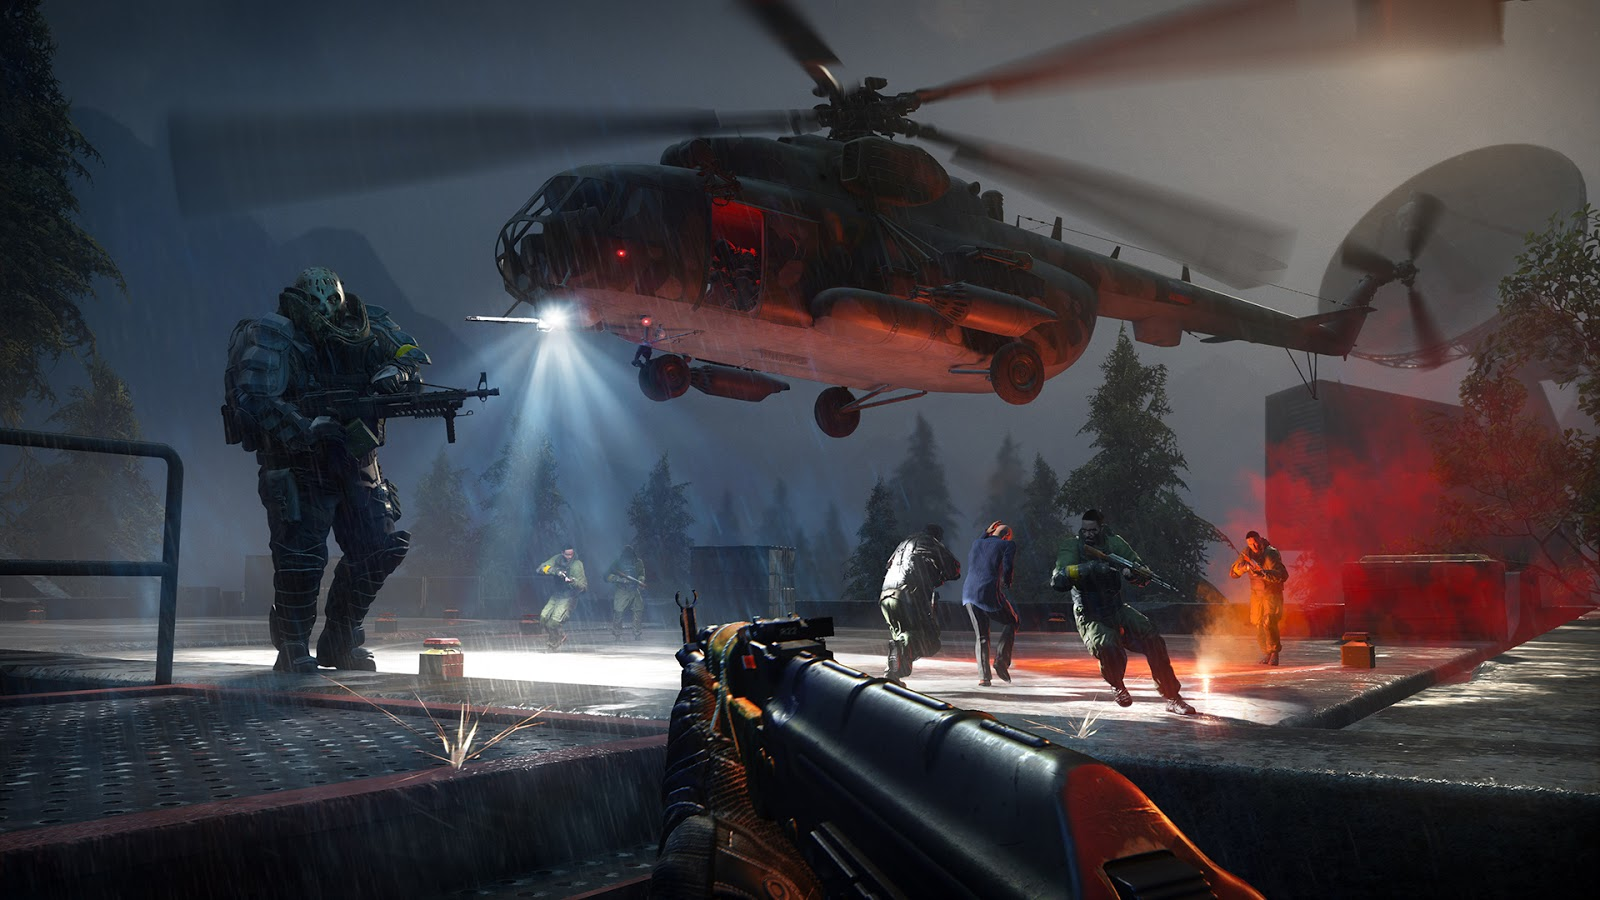 Sniper Ghost Warrior 3 ESPAÑOL PC (CPY) + Update v1.08 (PLAZA) + REPACK 10 DVD5 (JPW) 5